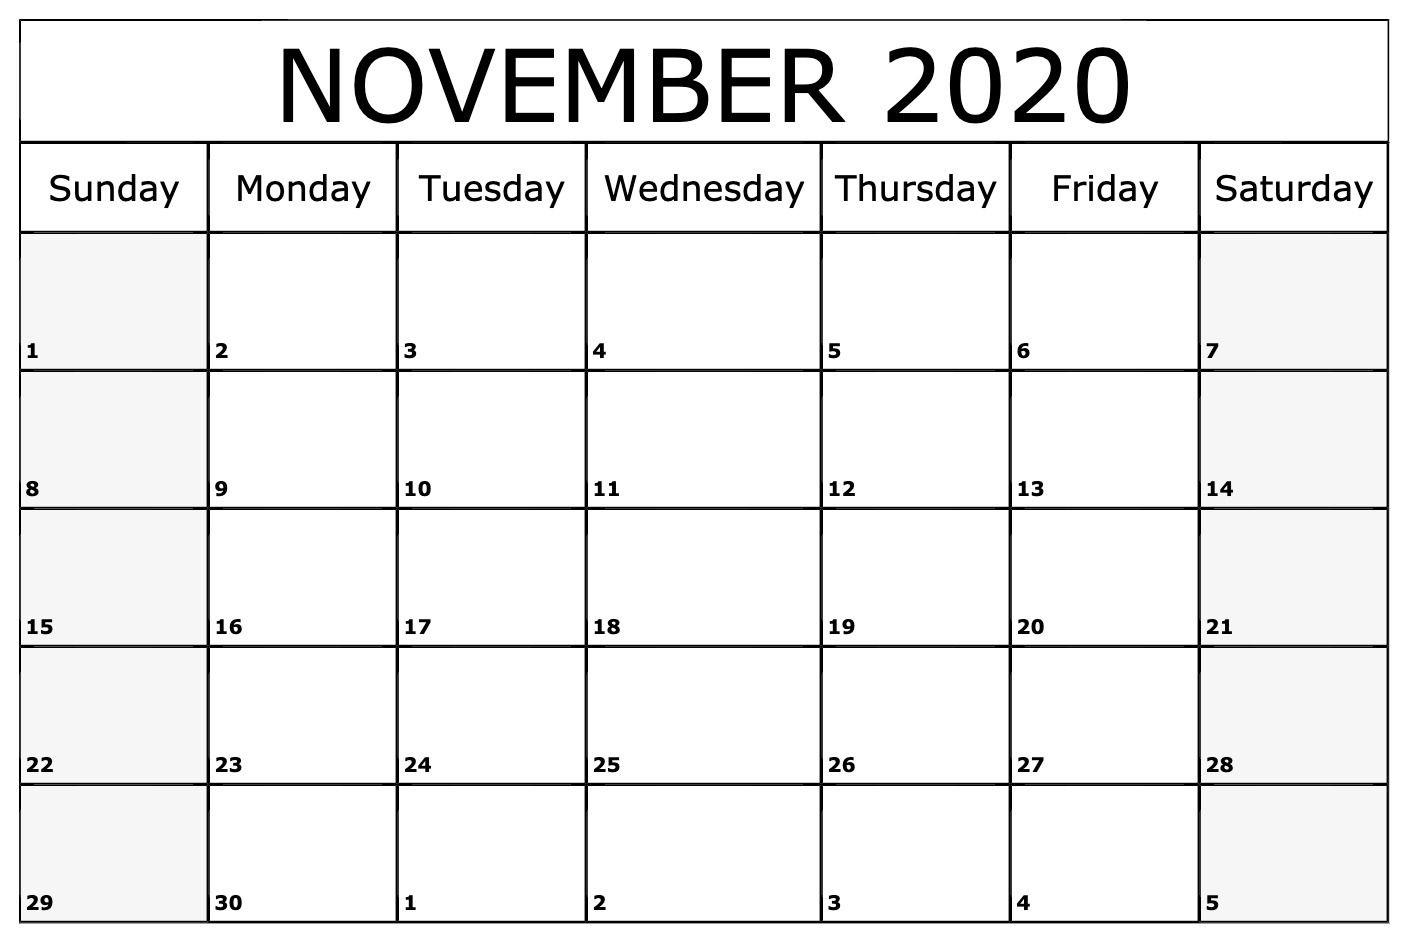 November 2020 Calendar Printable Template | September